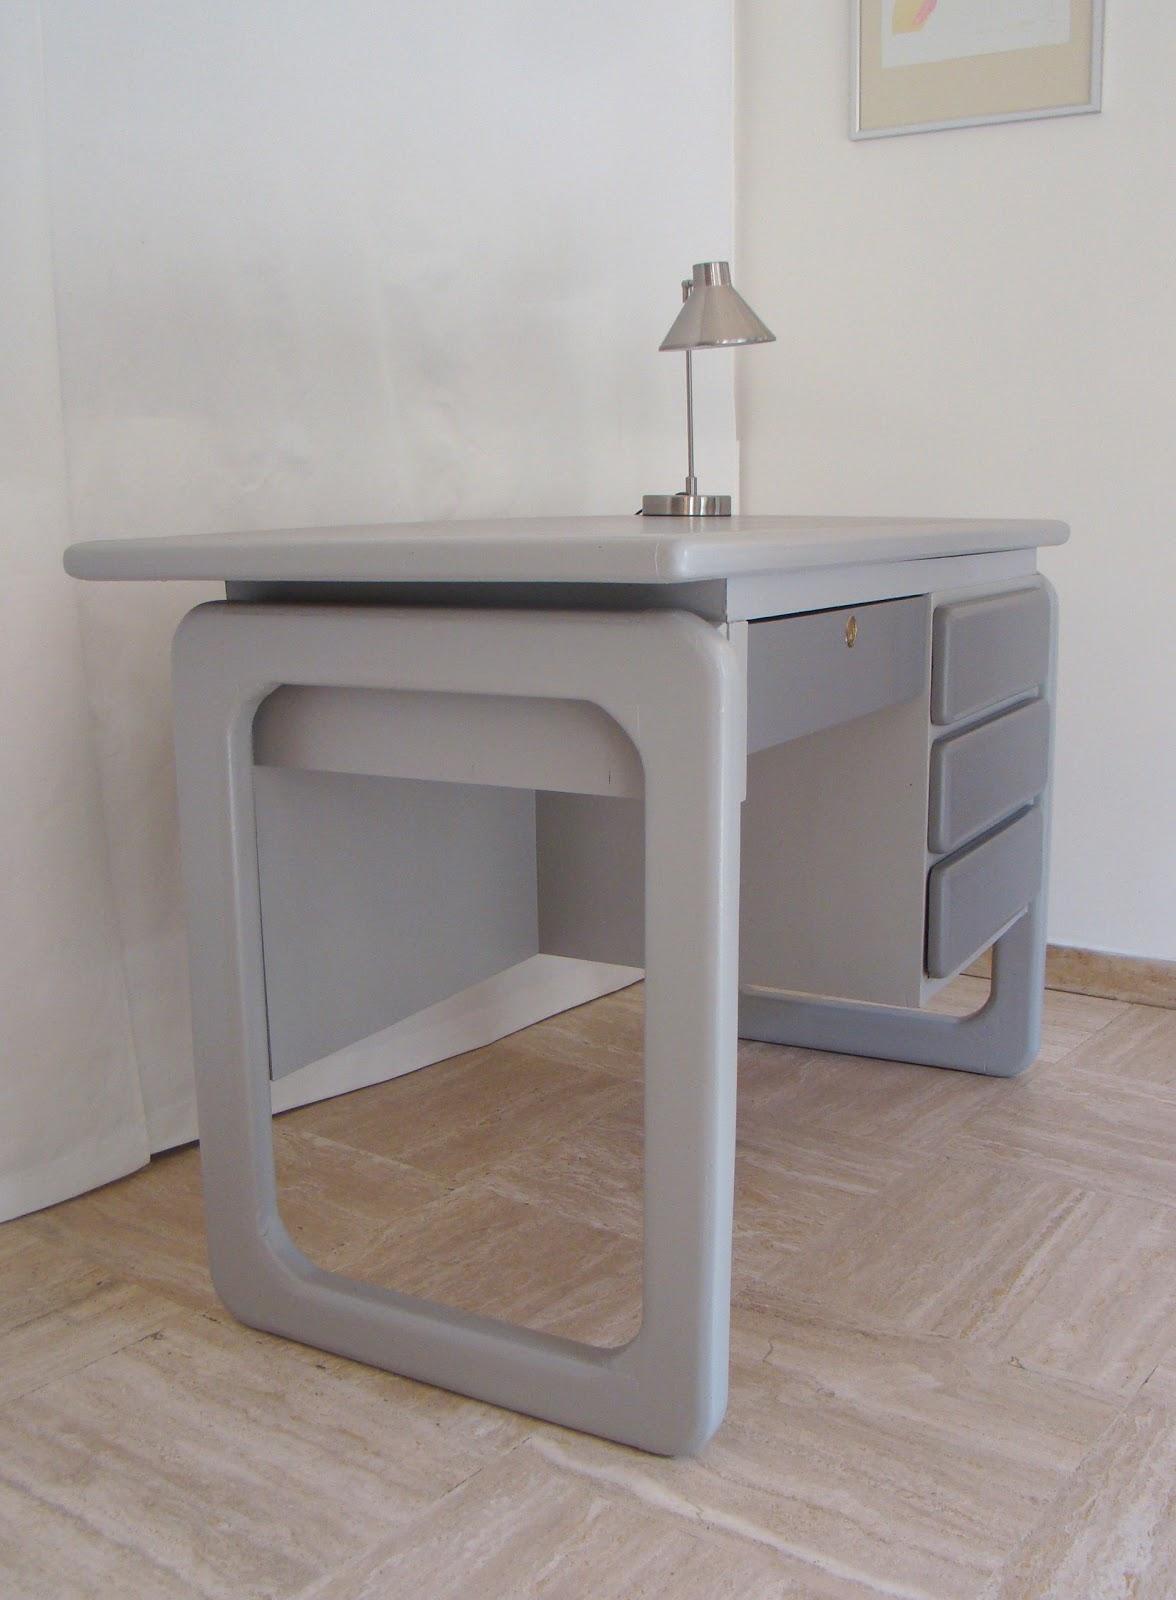 Bureau D Angle Arrondi vintage in villennes: bureaux